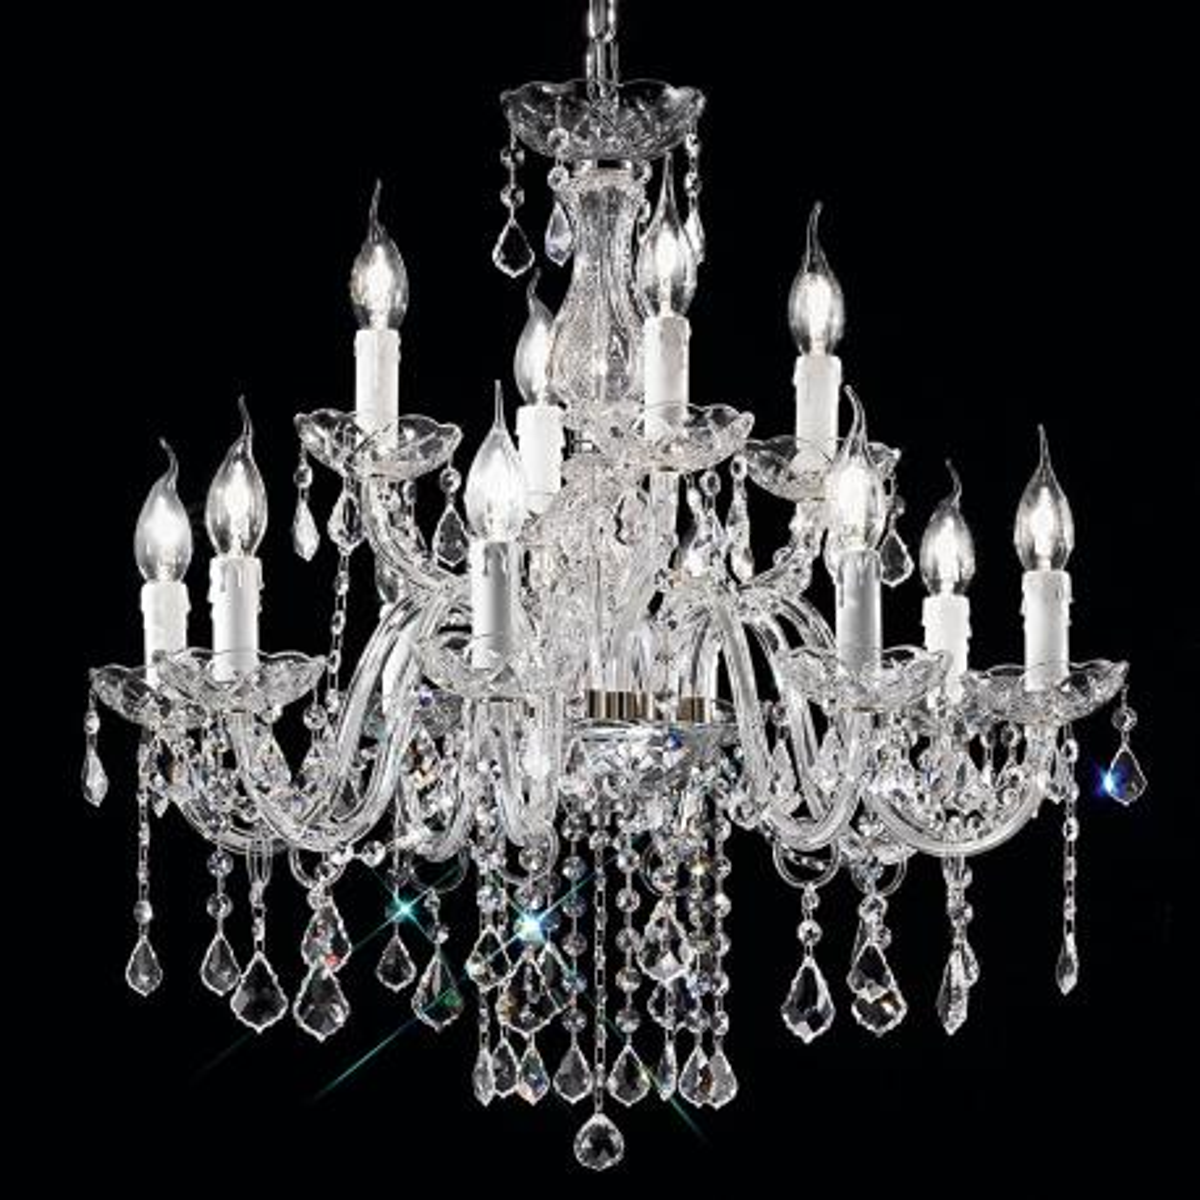 """Alfieri"" lampara veneciana en cristal - 8+4 luces - transparente con cristal Asfour"